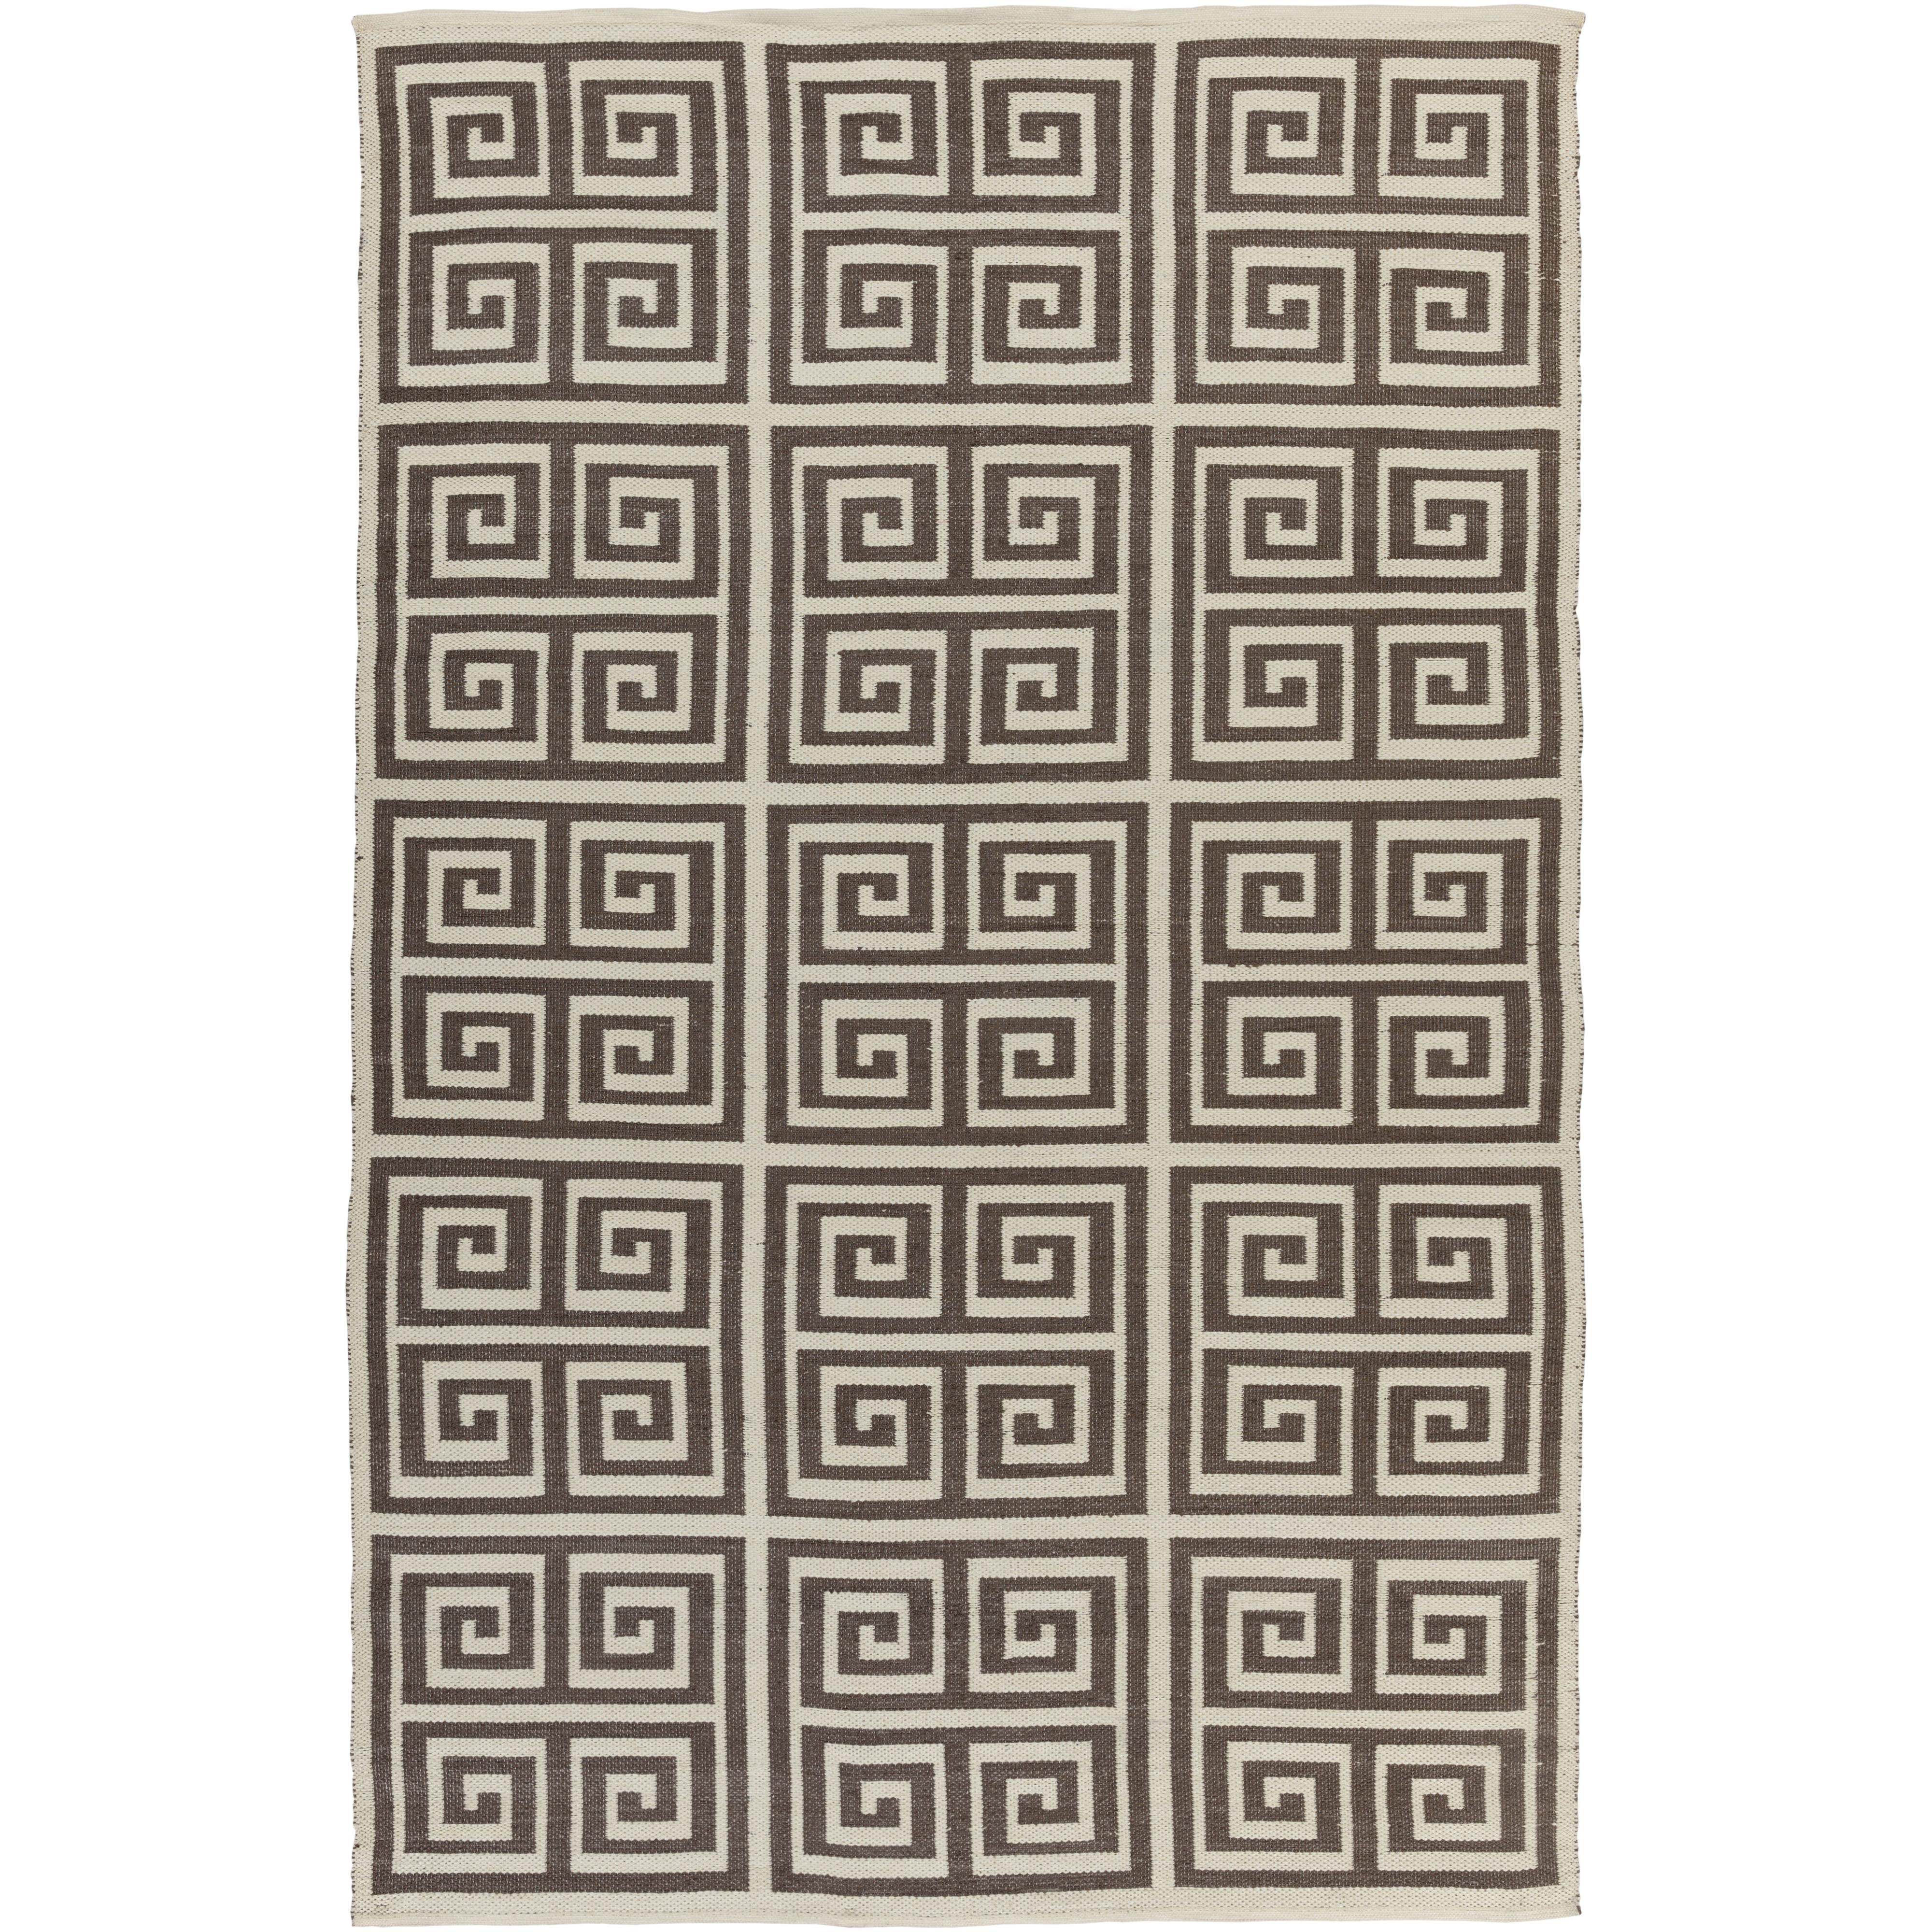 Surya Rugs Picnic 5' x 8' - Item Number: PIC4004-58